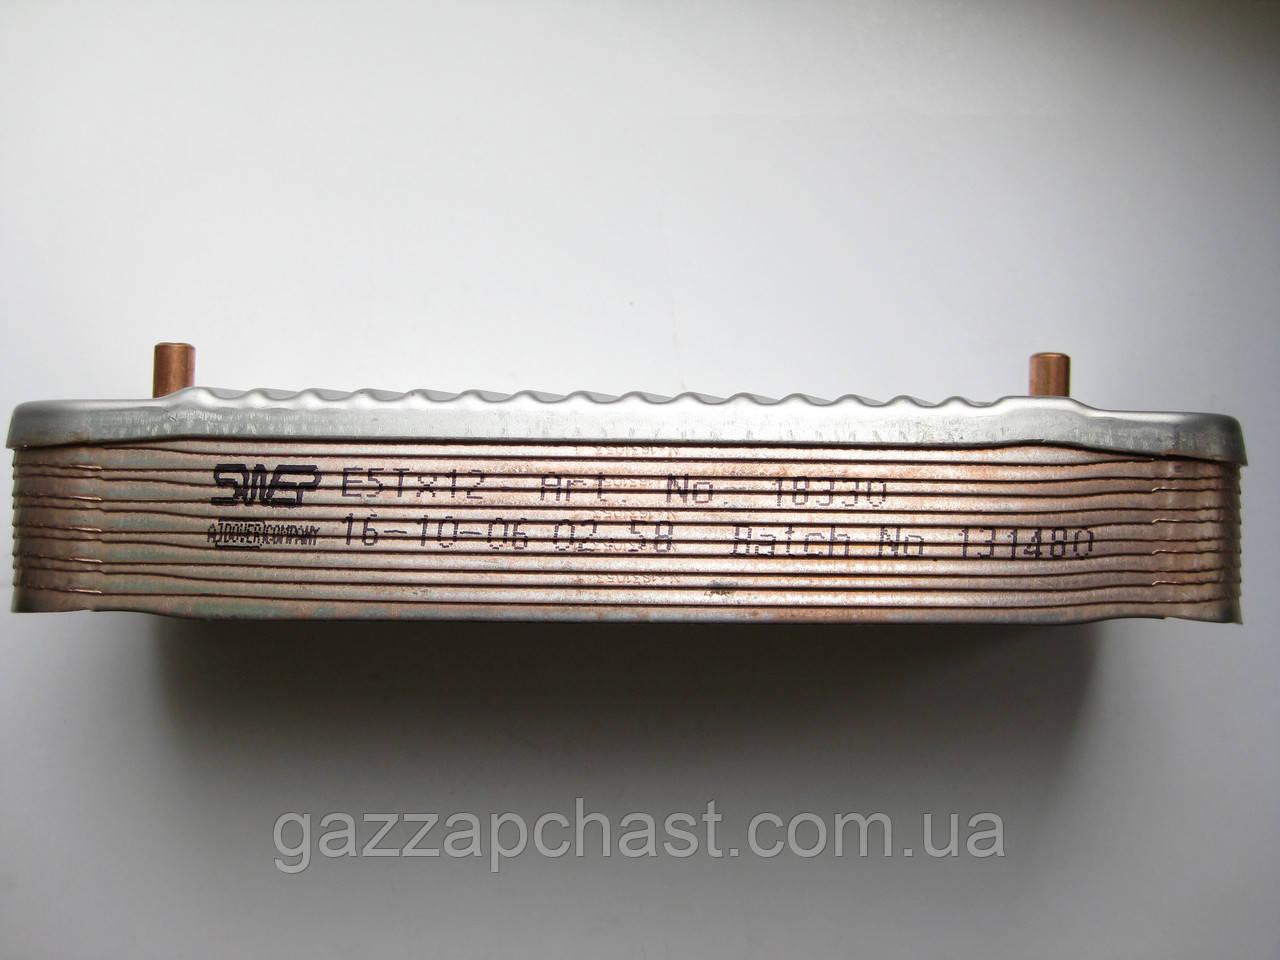 Теплообменник пластинчатый  Biasi Innovia, Rinnova, Delta, Parva (BI10110001)